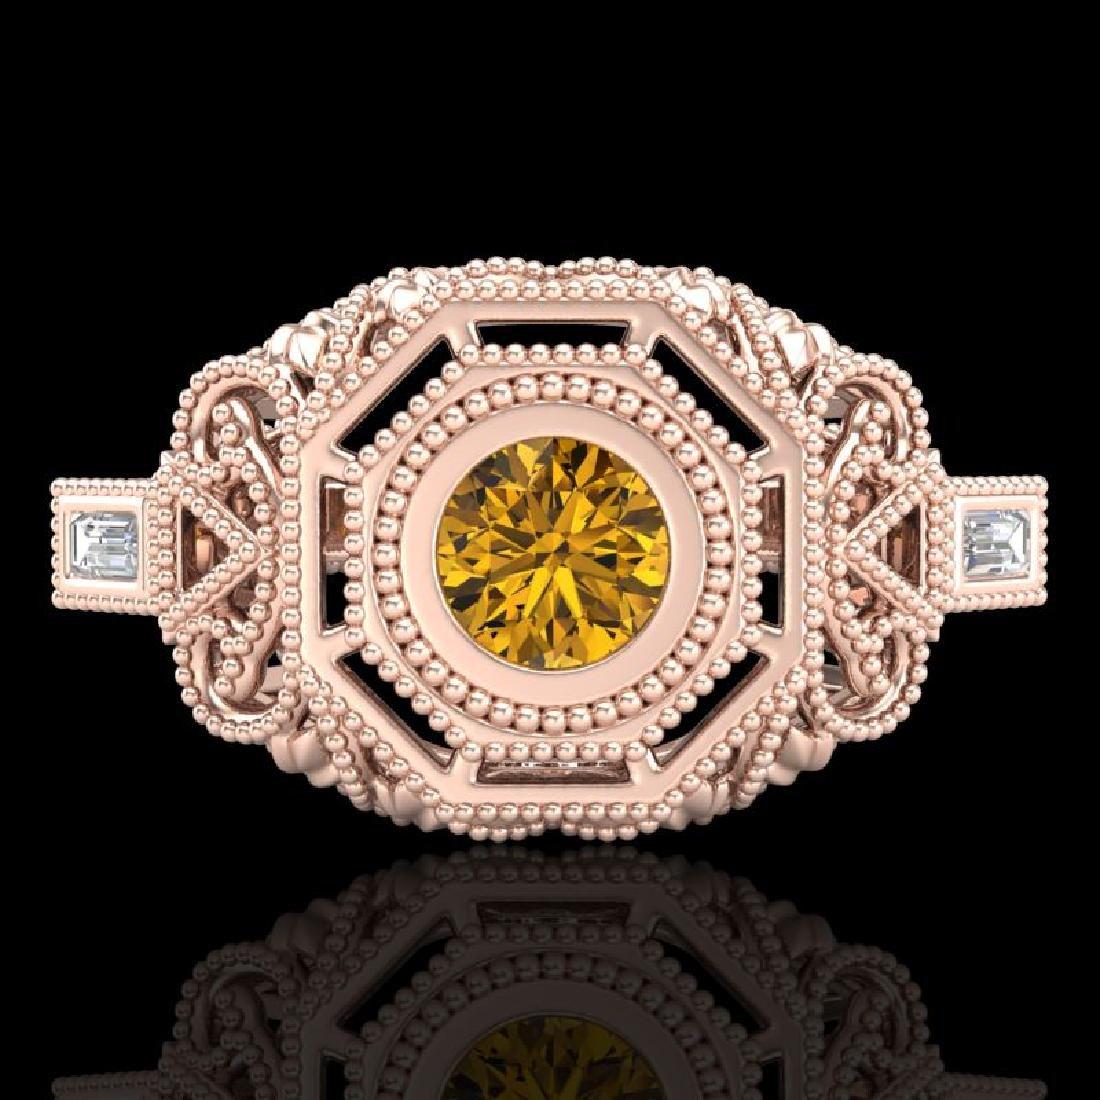 0.75 CTW Intense Fancy Yellow Diamond Engagement Art - 2